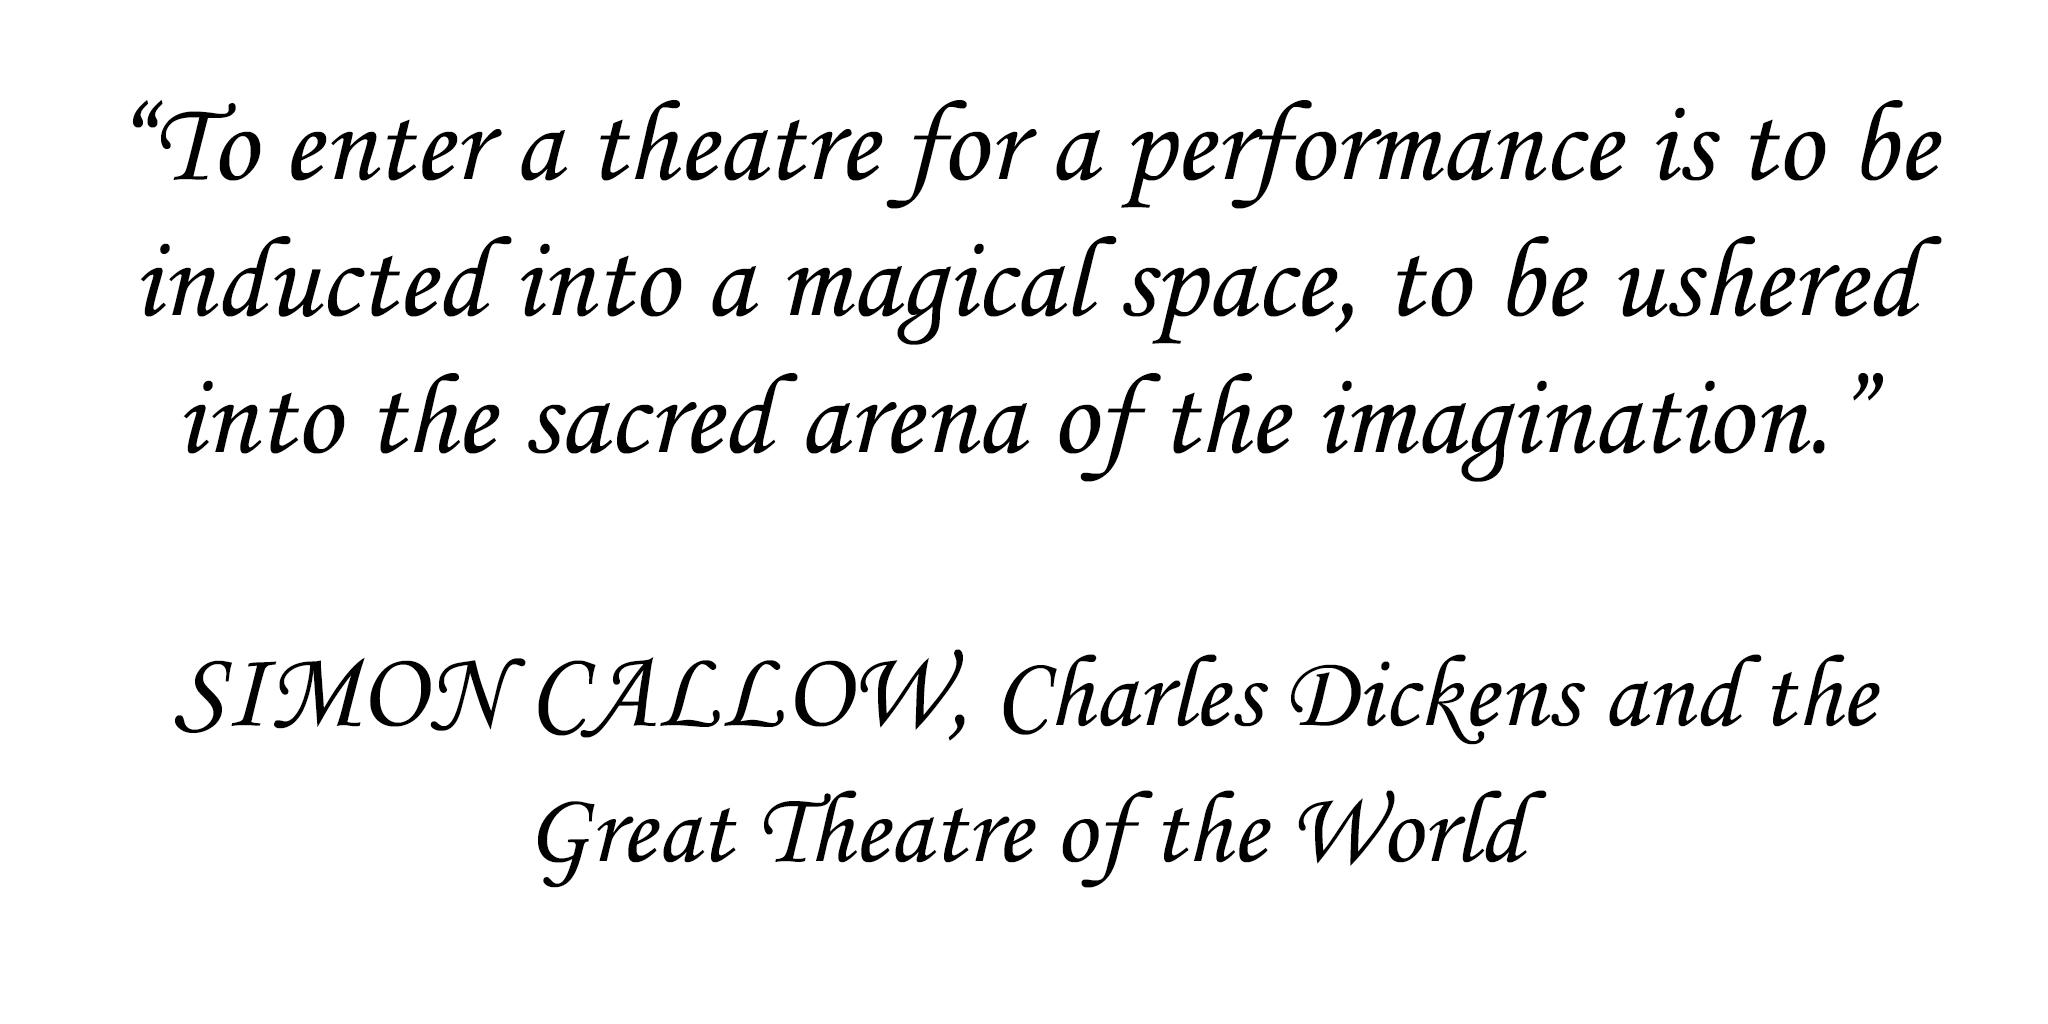 Theatre Quote.jpg